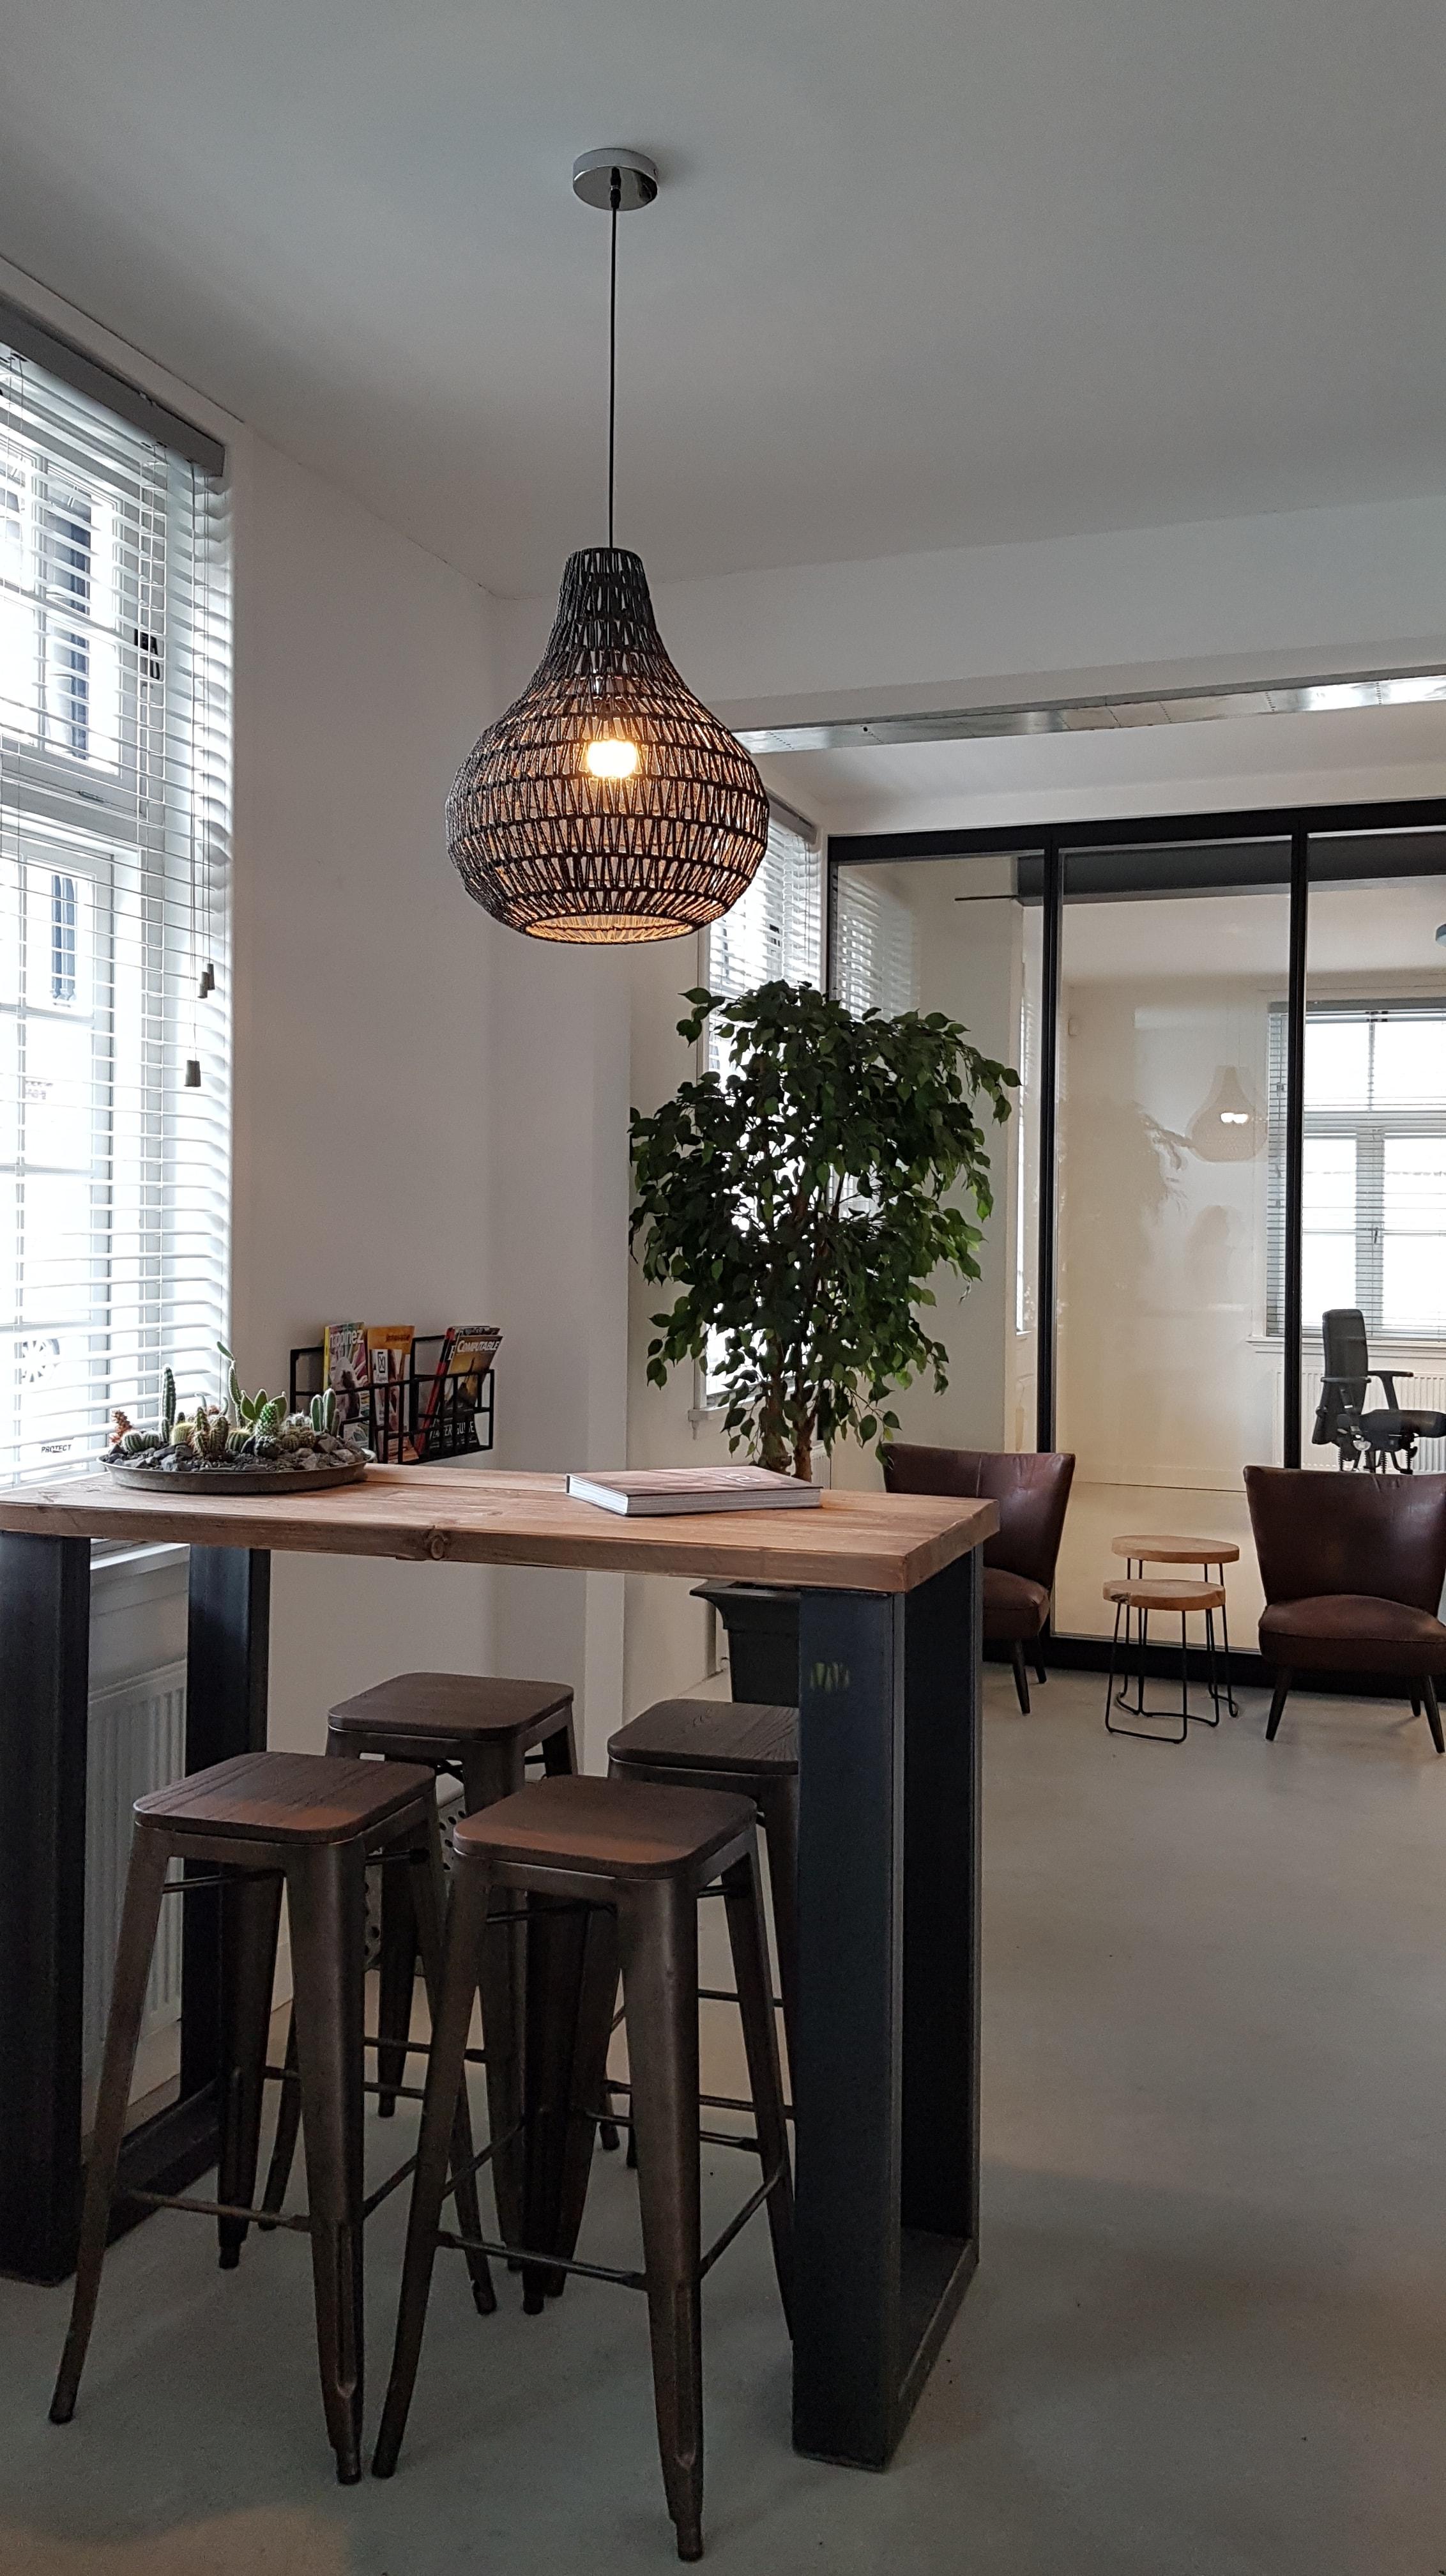 KVL Oisterwijk – Architectenbureau Drijvers Oisterwijk B.V.